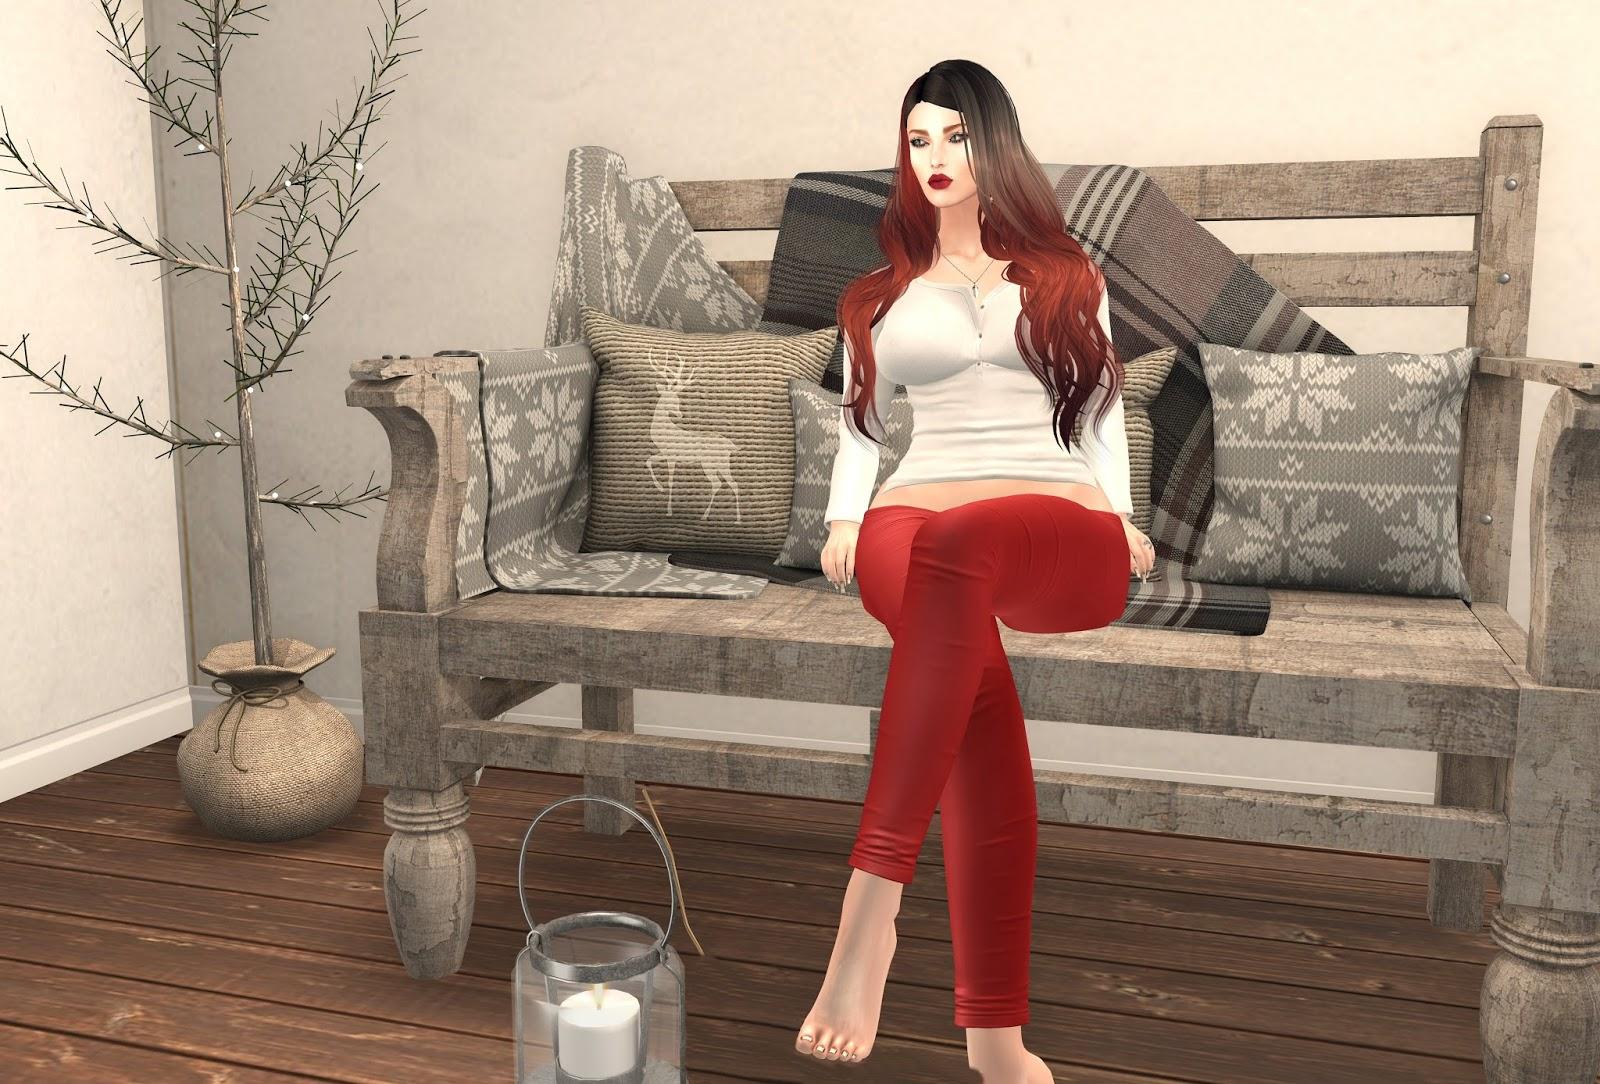 Perv My Style - Second Life Fashion Blog: So Many Ways To